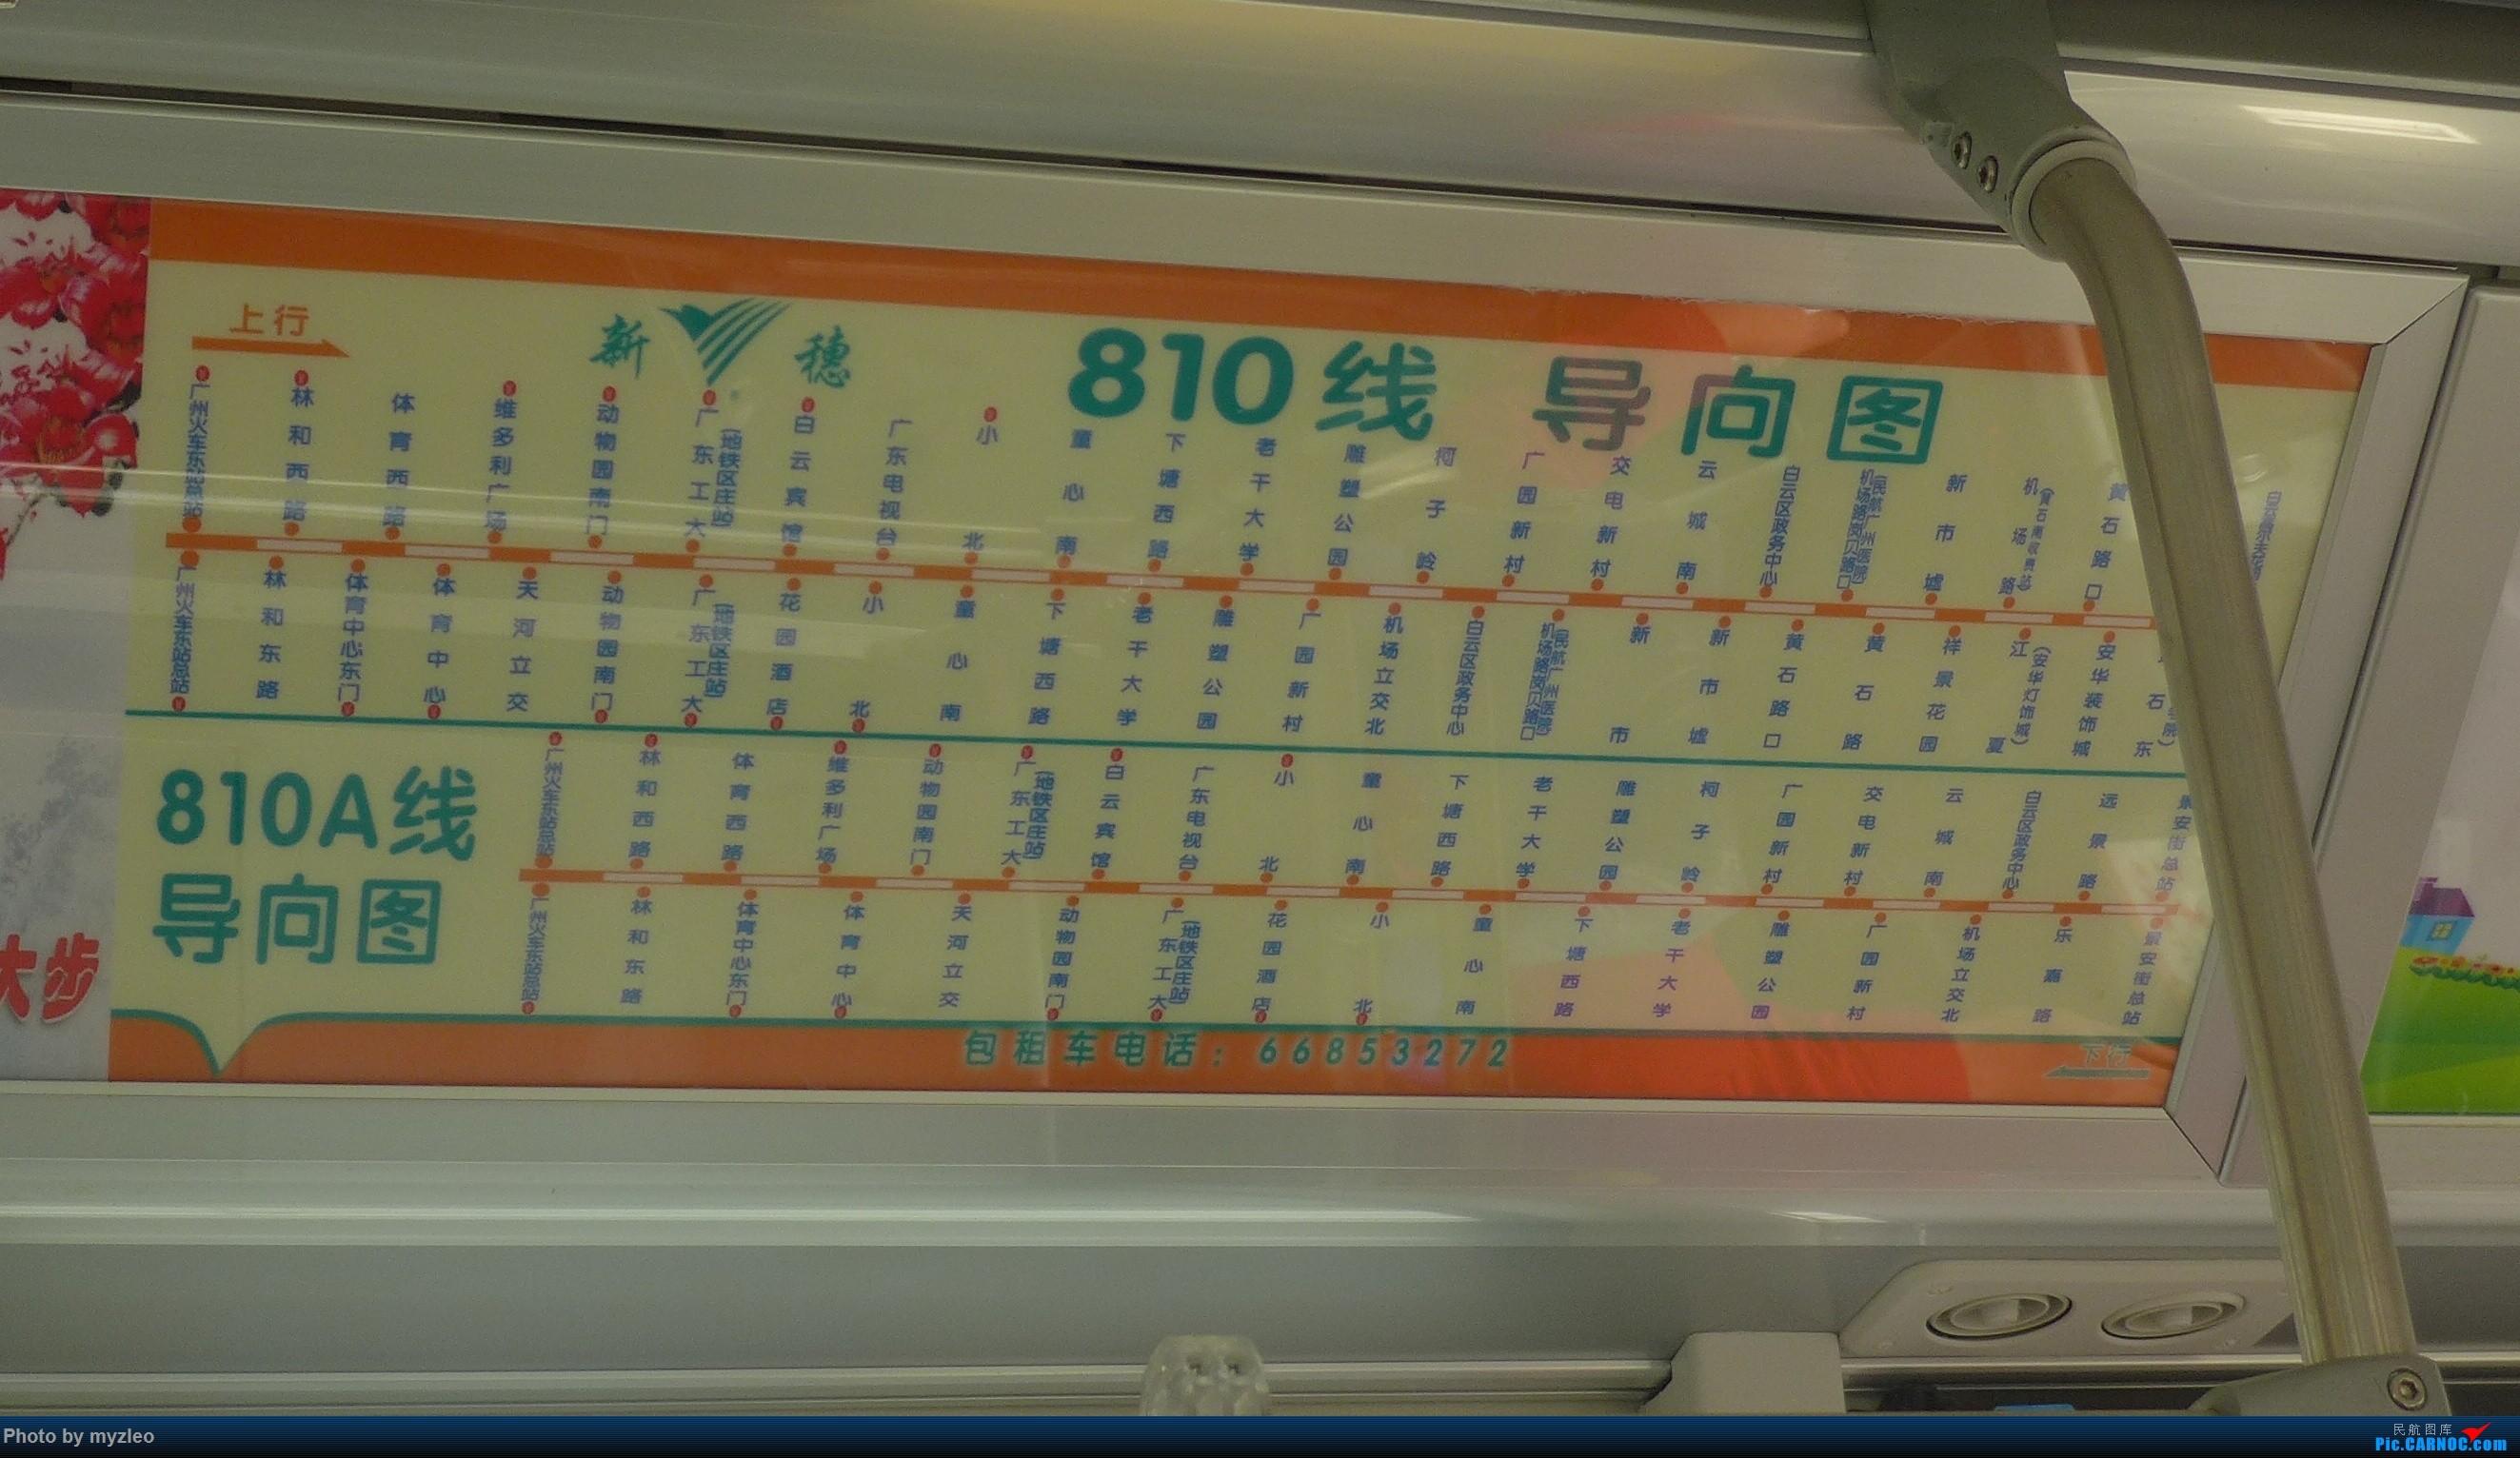 Re:[原创]【myzleo的游记1】六天五晚广州行——SHA-CAN上航商务舱初体验+广州城内+CAN-SHA南航老旧的738